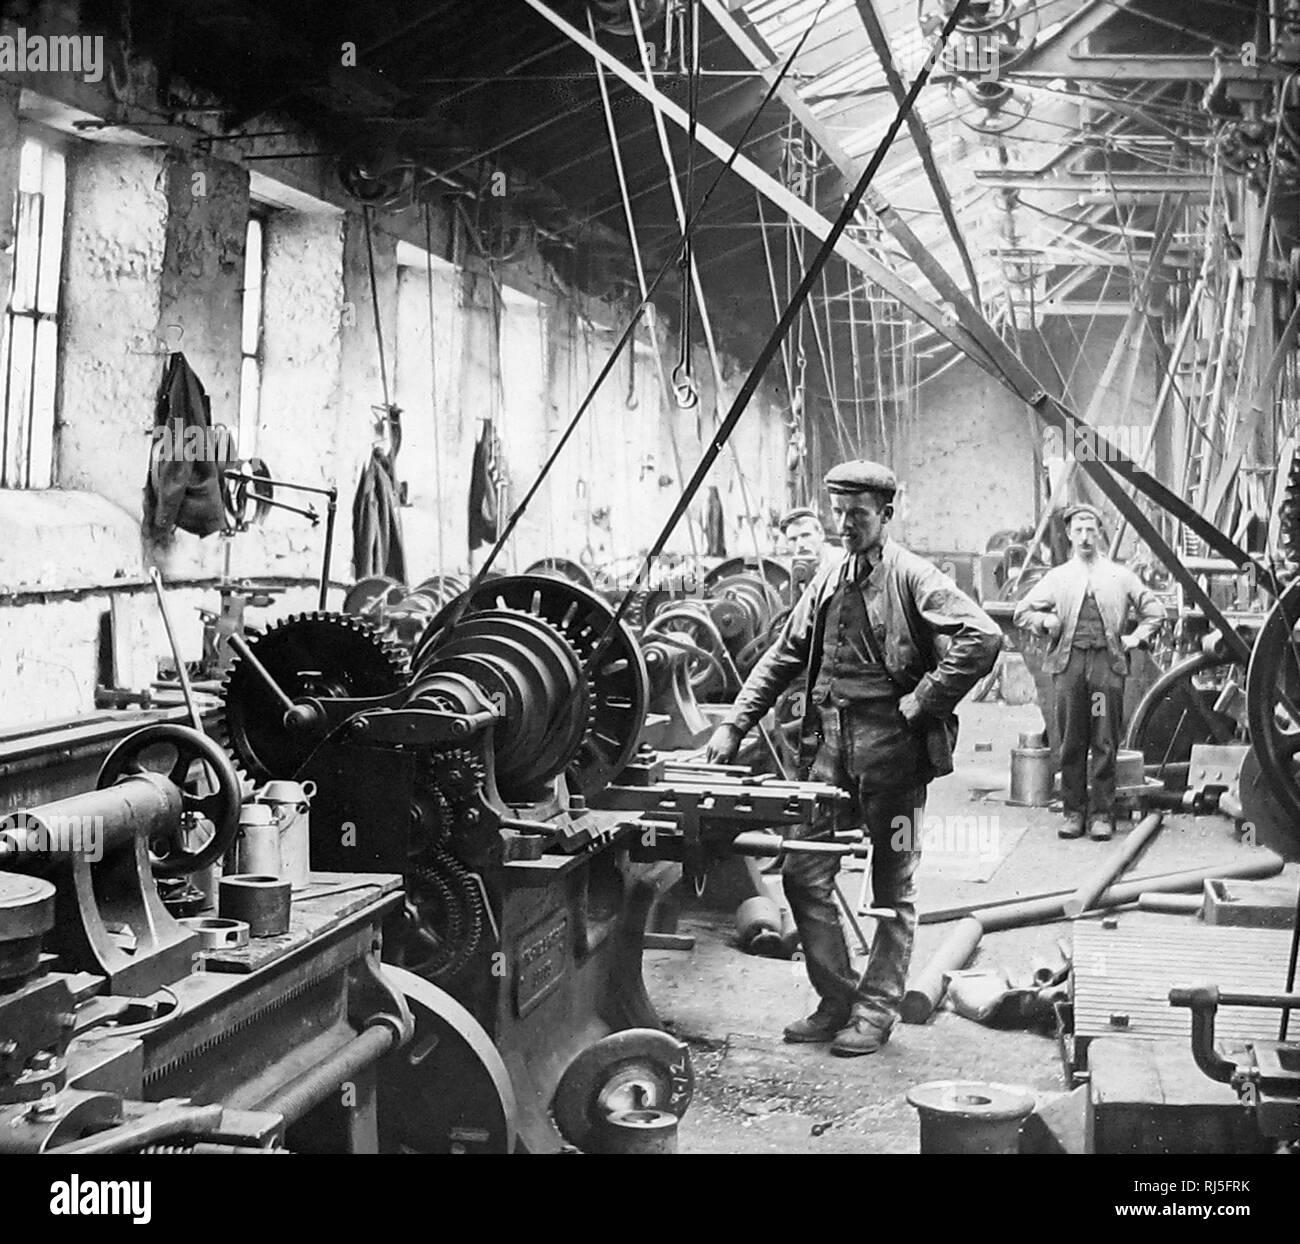 Ironworks Black And White Stock Photos Images Alamy